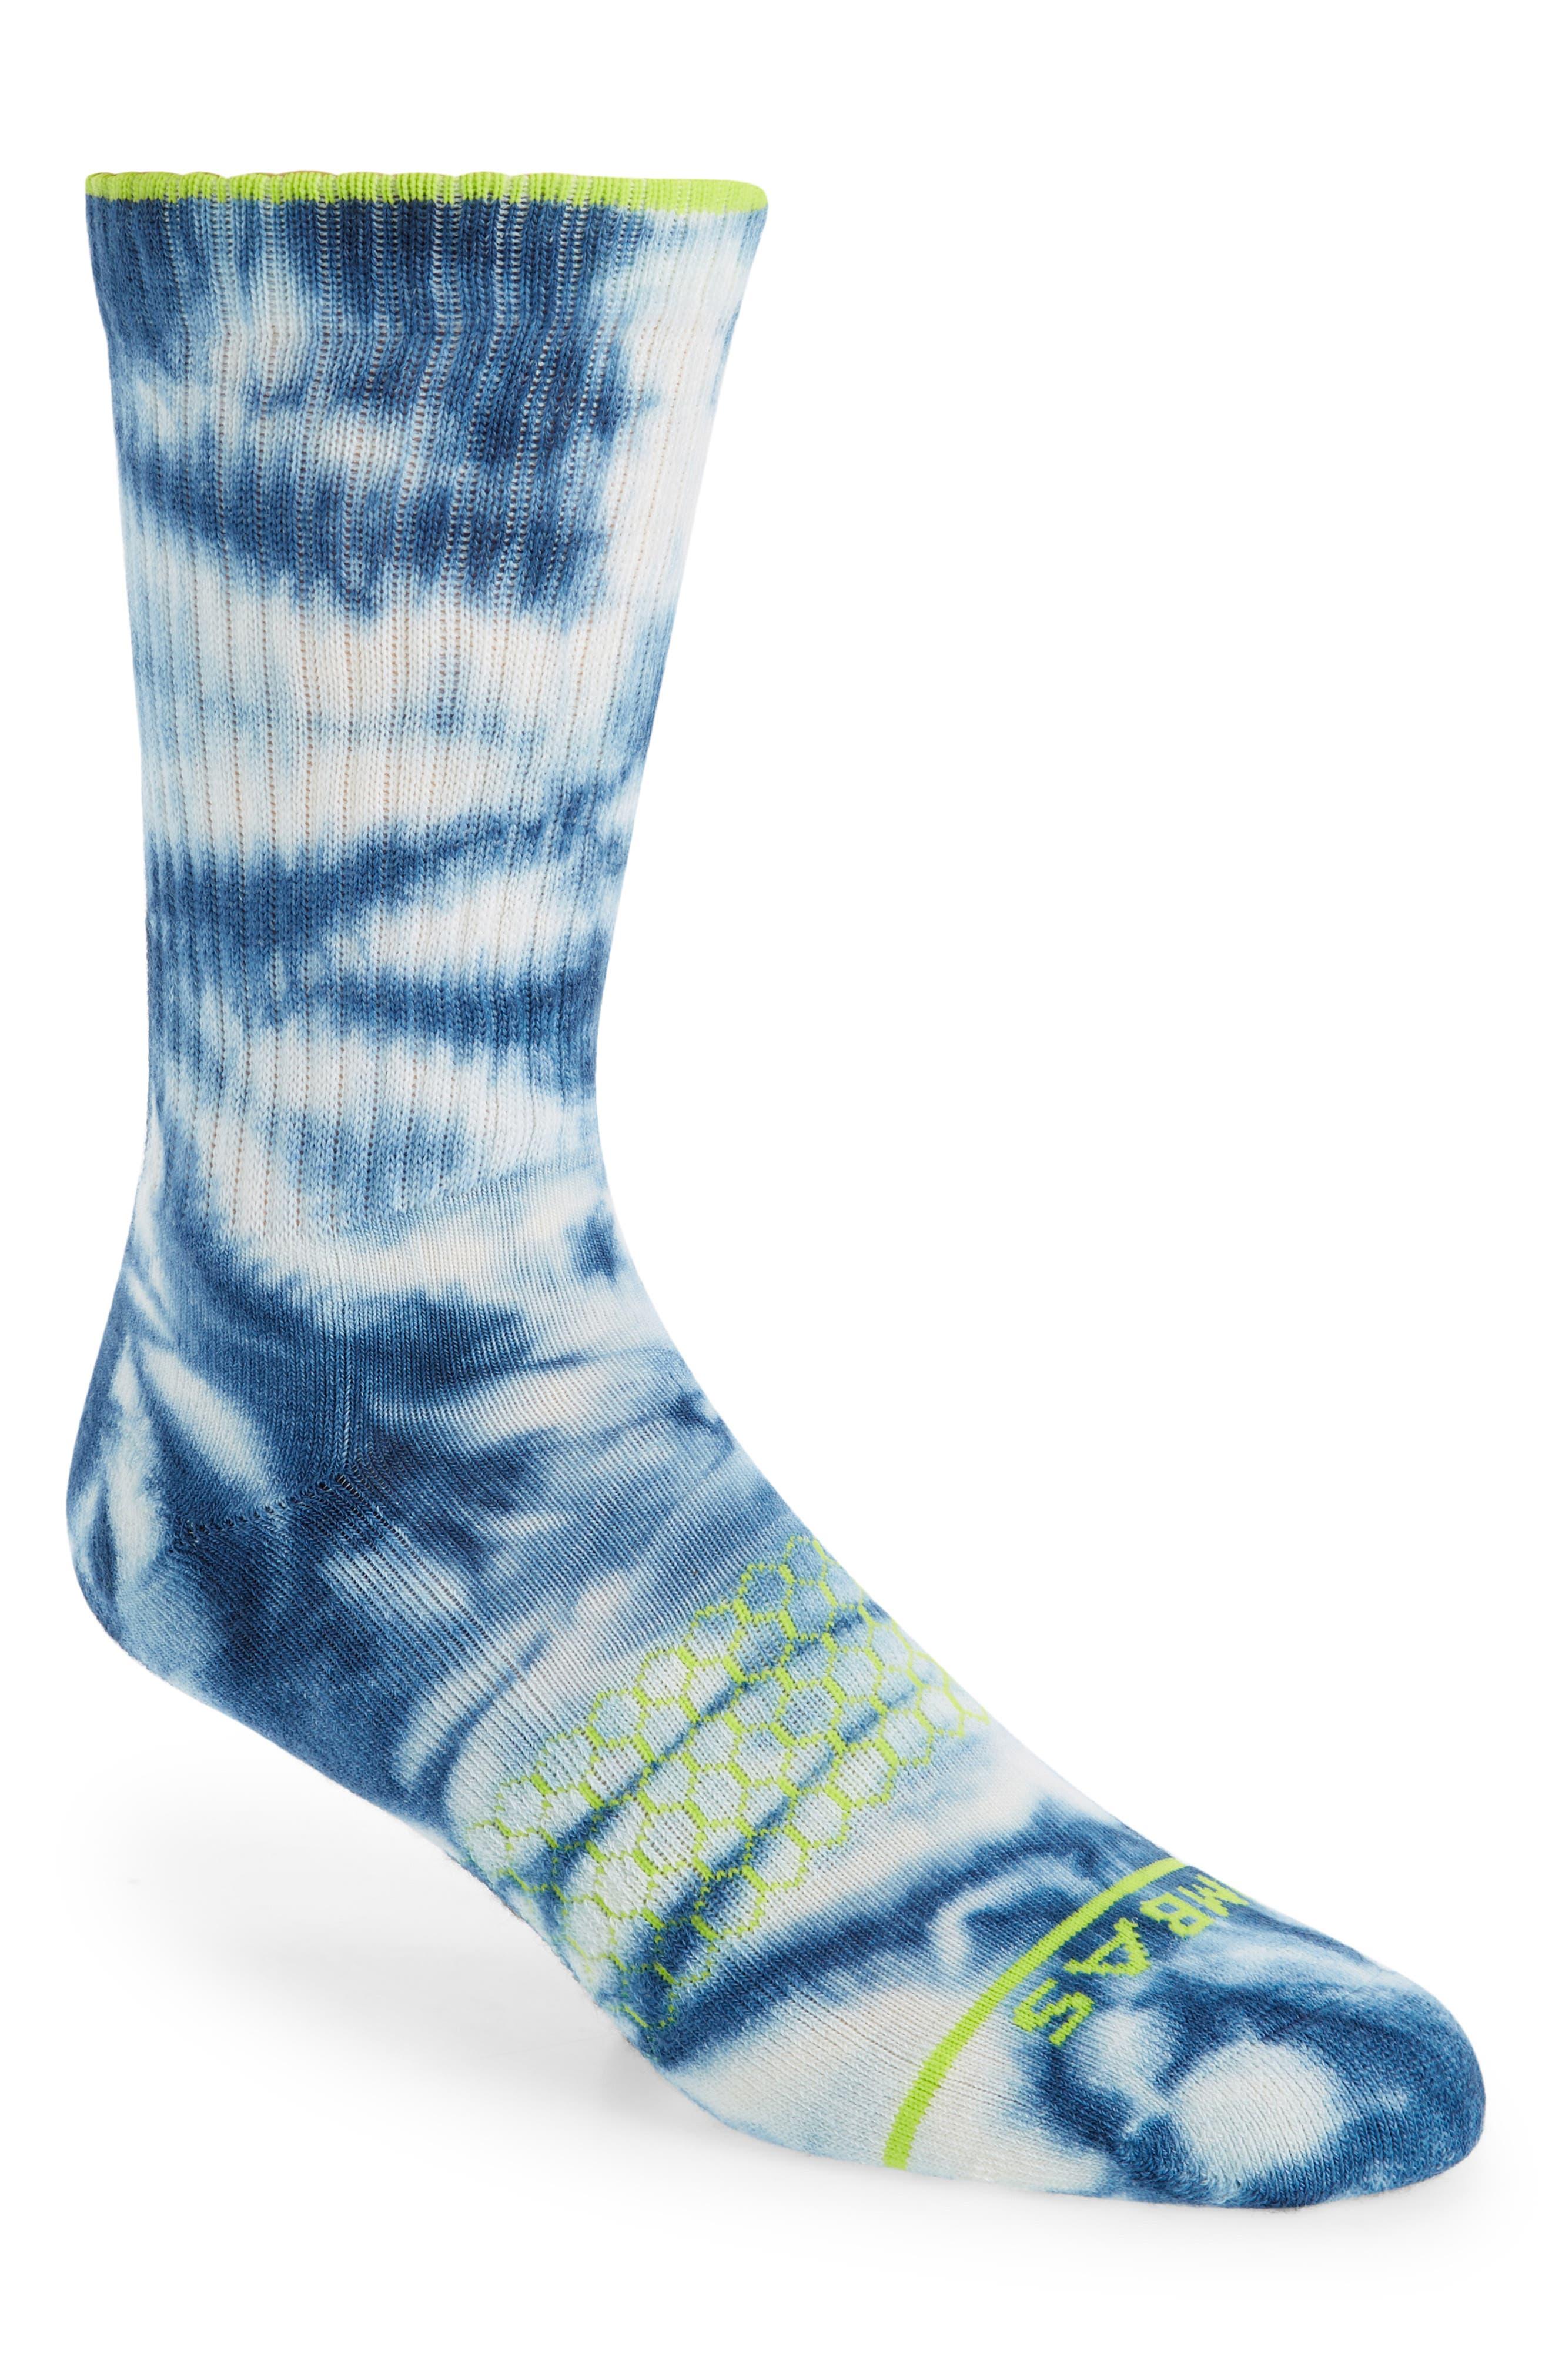 Tie Dye Merino Blend Crew Socks